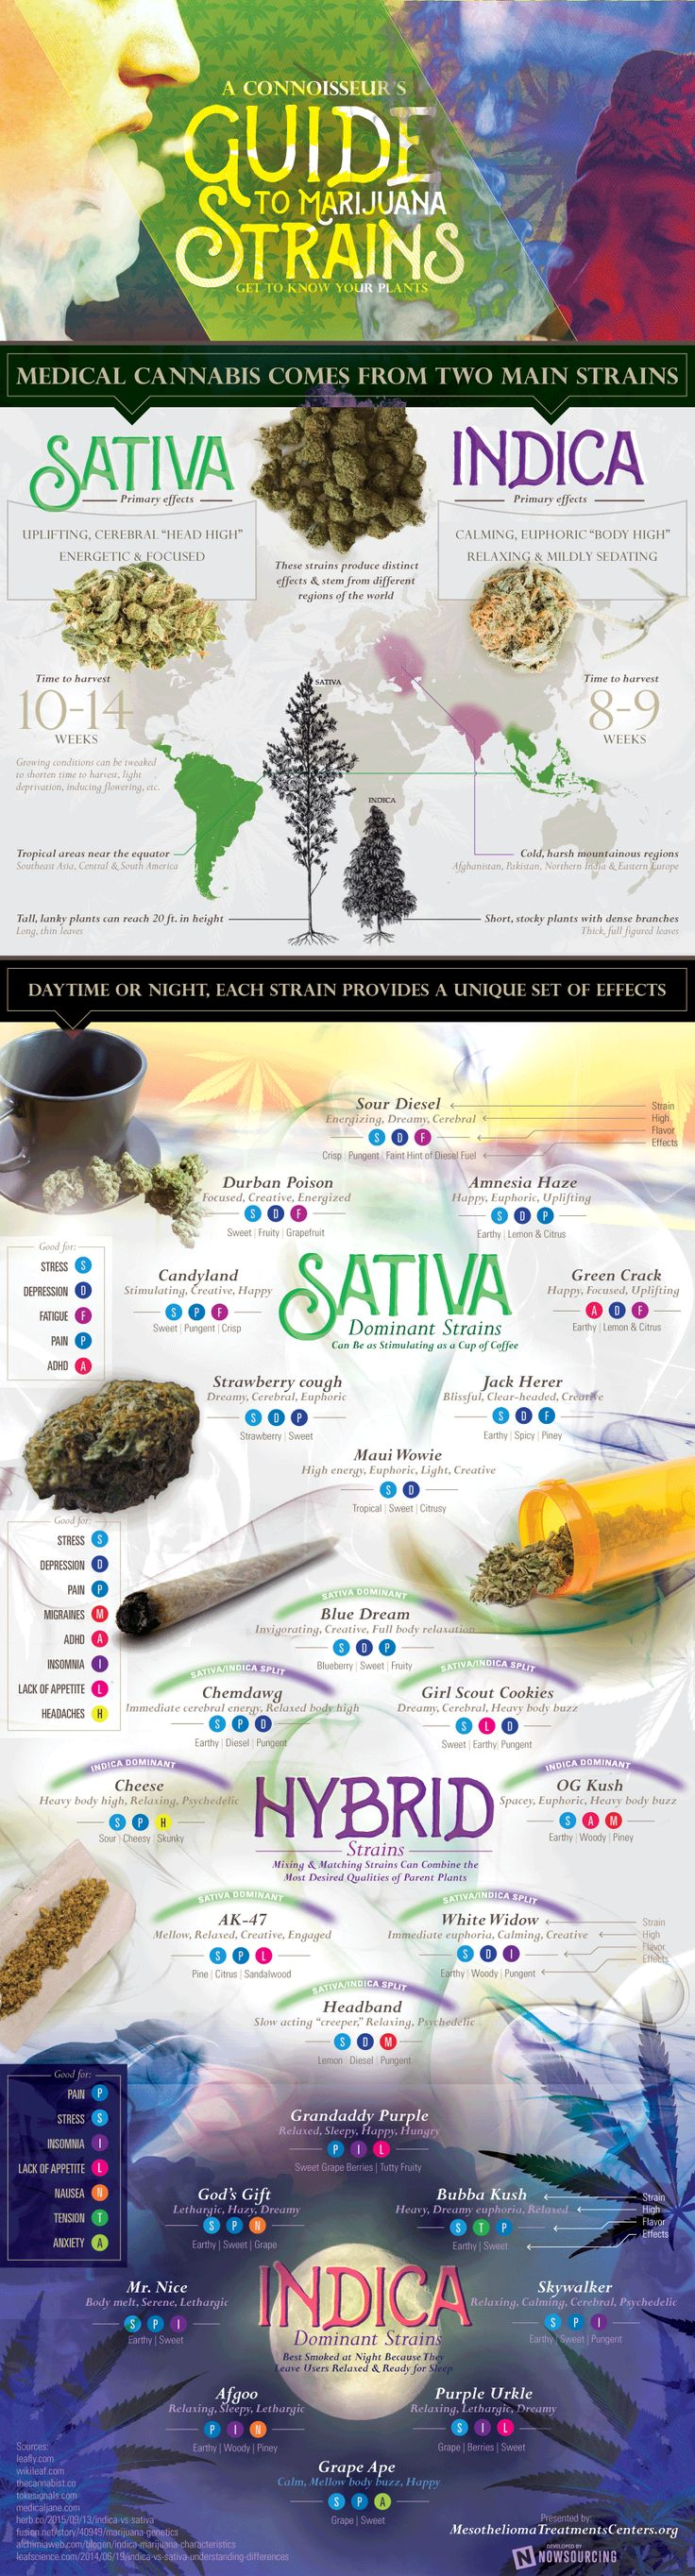 Get To Know Marijuana Plants Better - Infographic http://stores.ebay.com/nutritionalwellnessstore